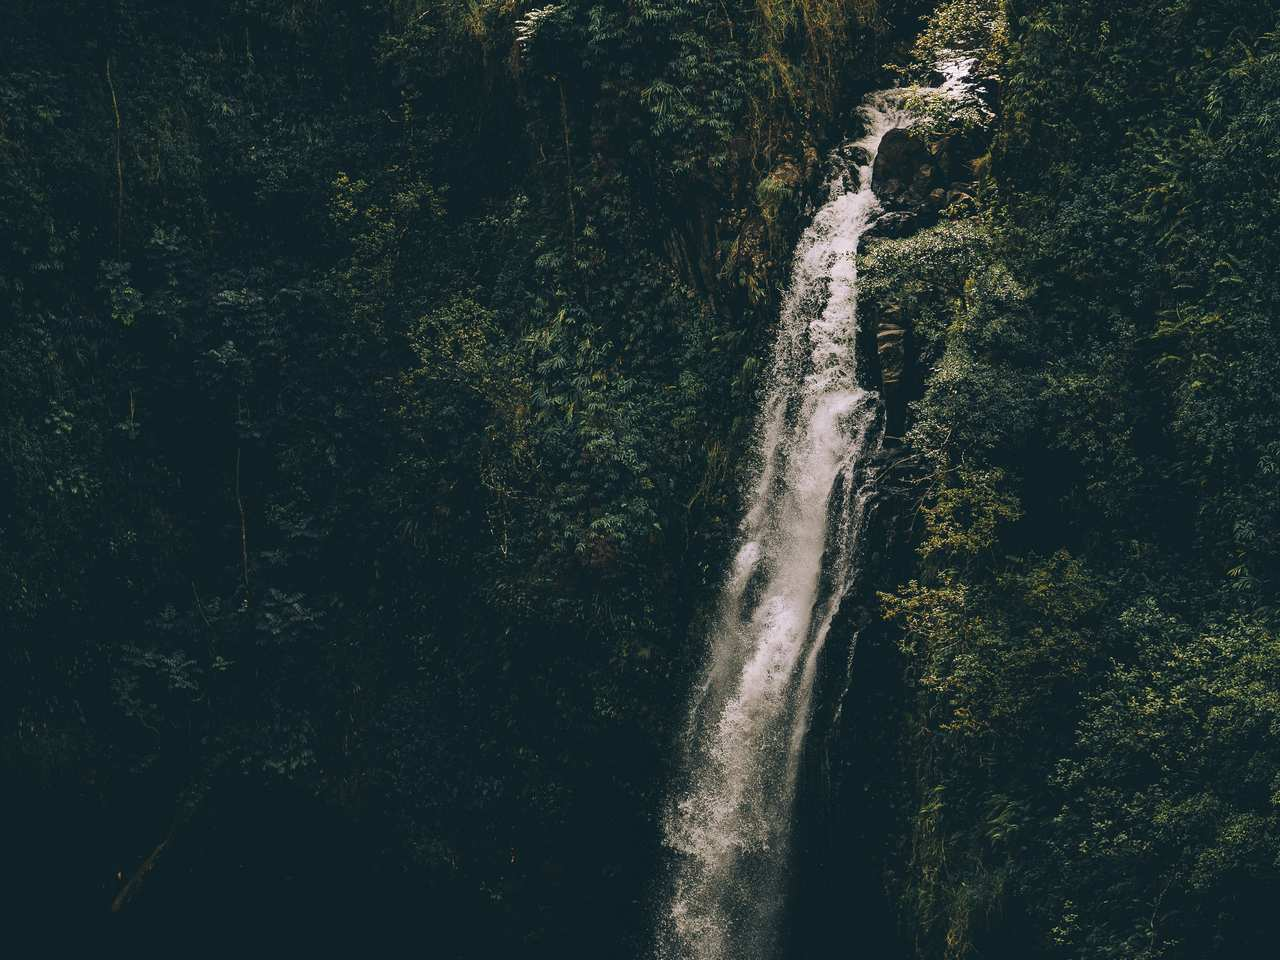 stadt, land, fluss, städte, länder, flüsse, fluß, gebirge, seen, meer, meere, berg, berge, alpen, hochgebirge